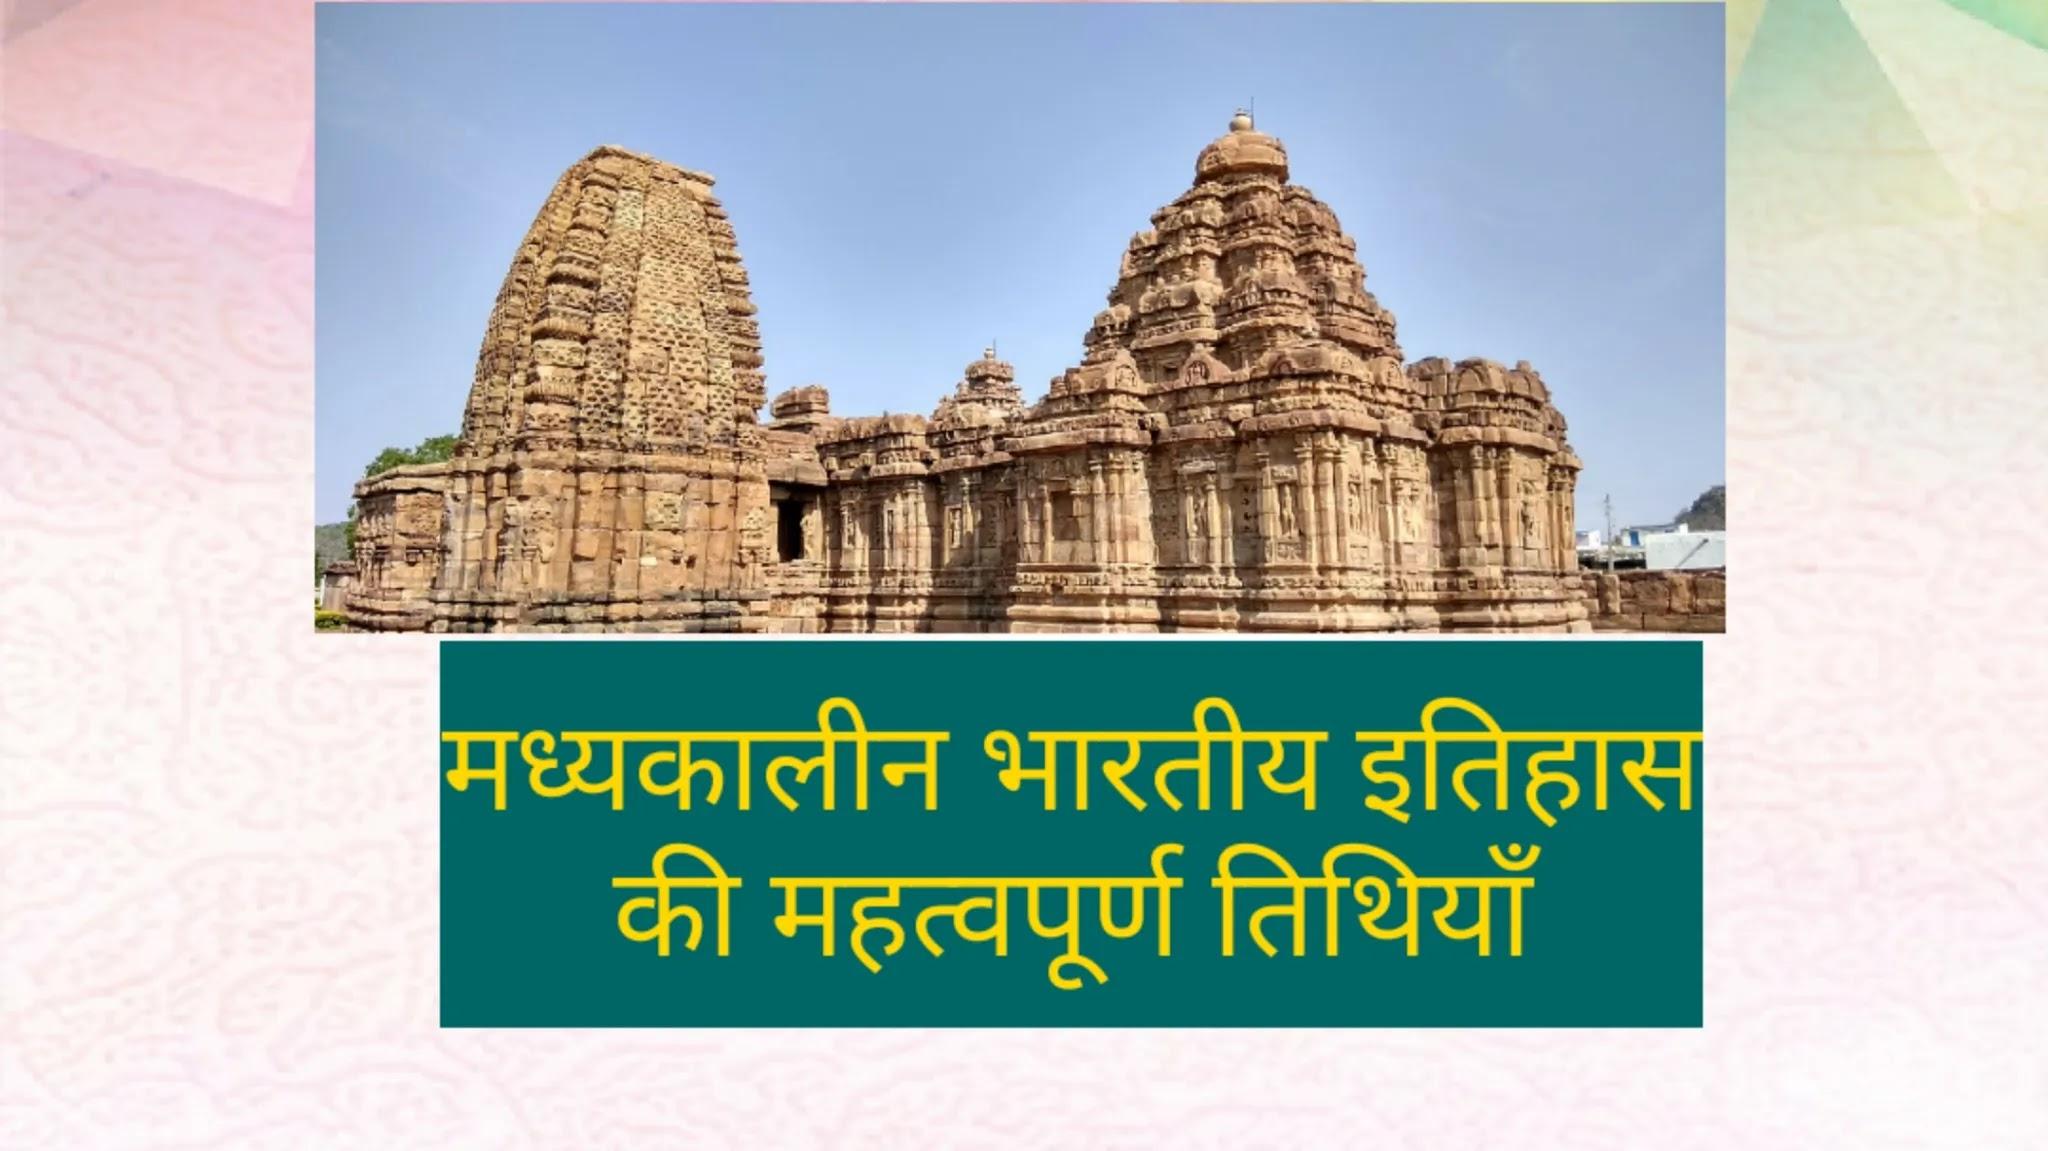 मध्यकालीन भारतीय इतिहास की महत्वपूर्ण तिथियाँ,  इतिहास की महत्वपूर्ण तिथियाँ, Medieval Indian History Important Dates